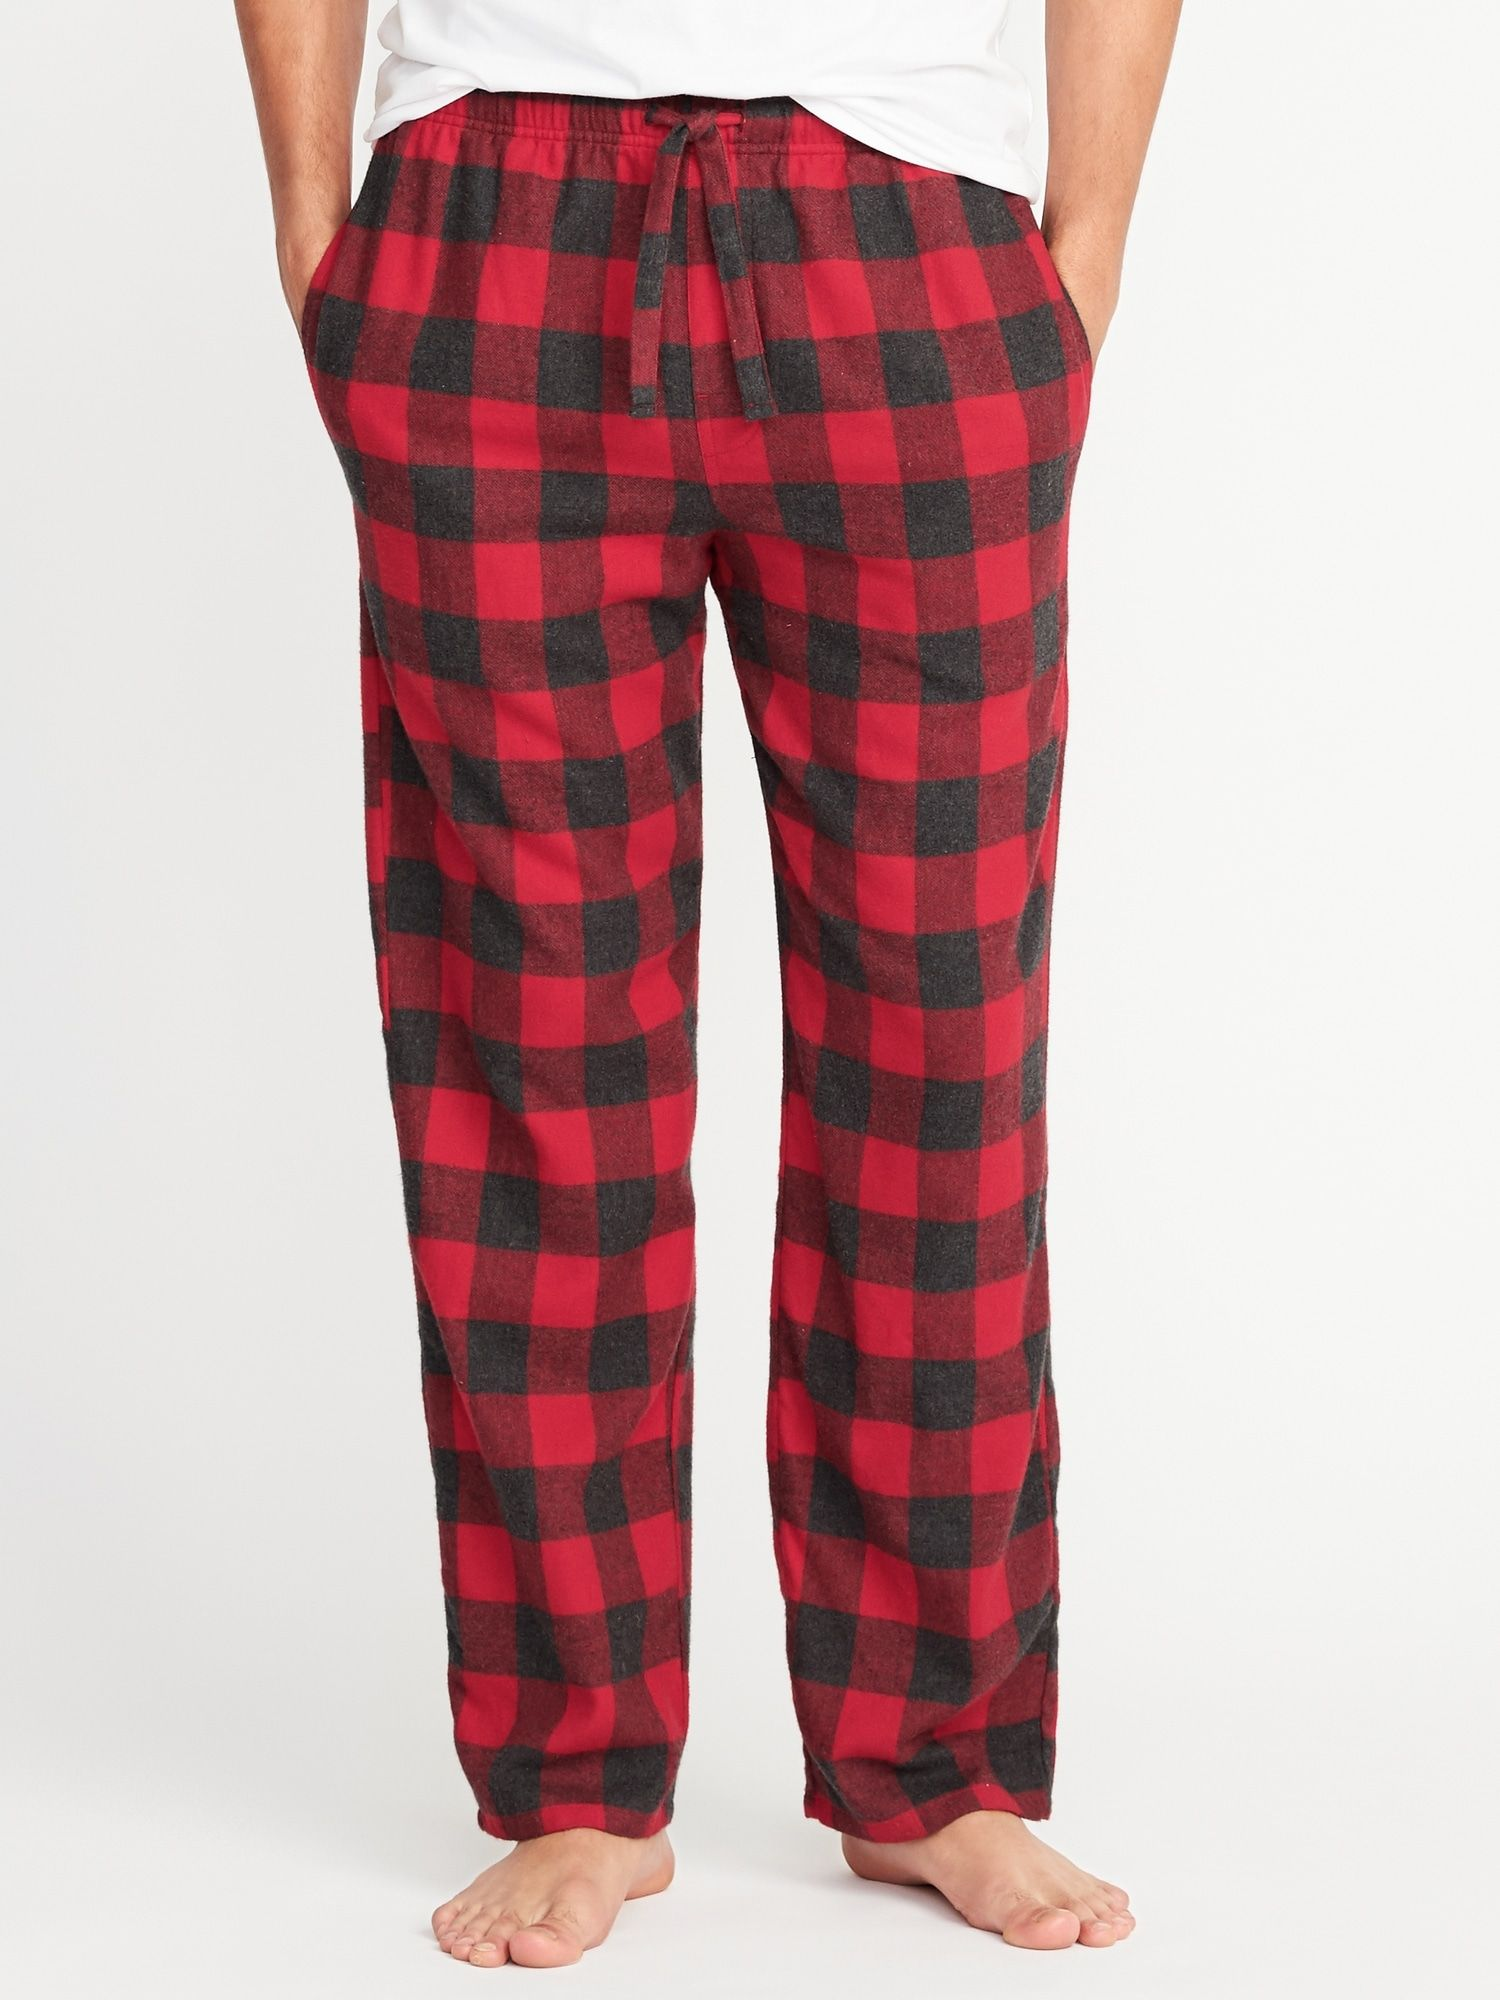 Patterned Flannel Sleep Pants for Men   Pinterest   Pj pants, Pj and ...